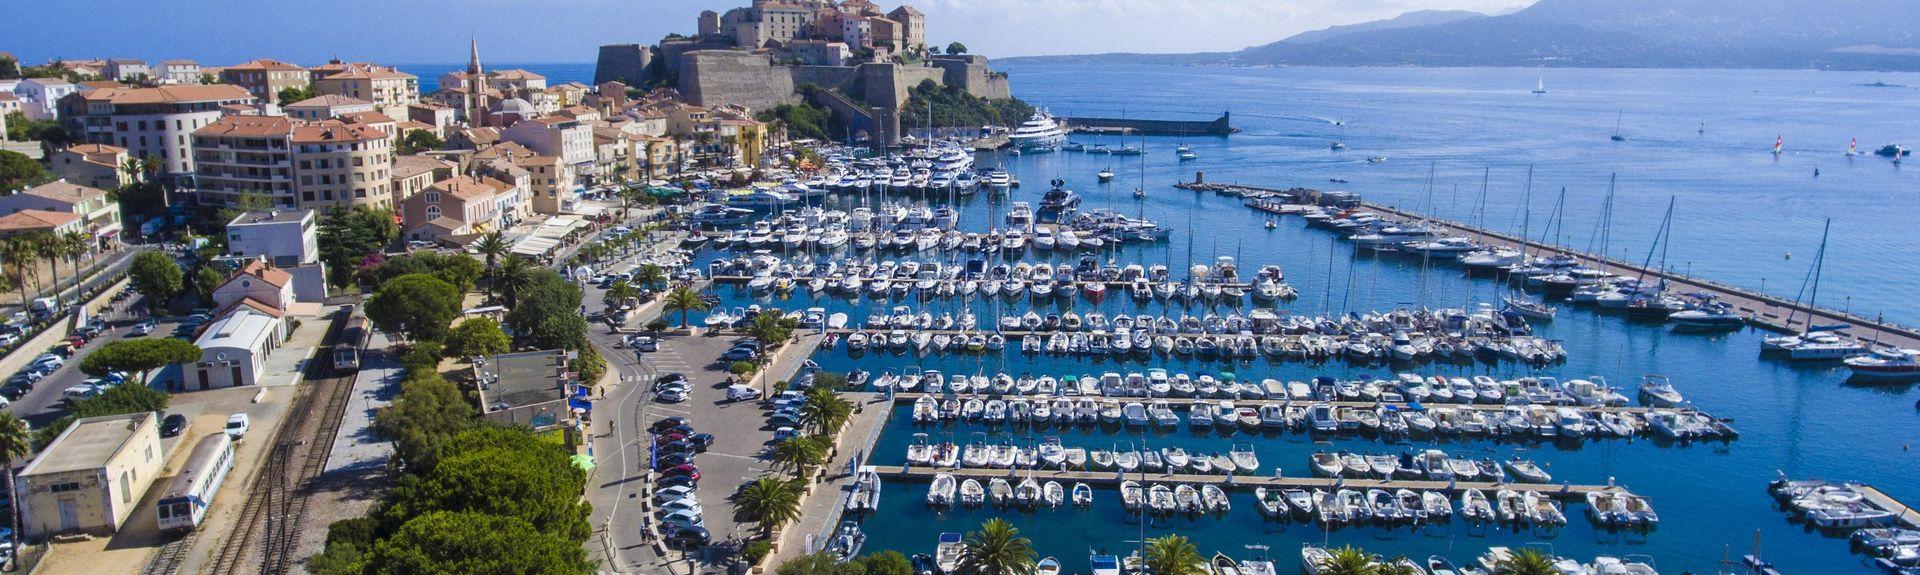 Haven van Calvi, Calvi, Corsica, Frankrijk